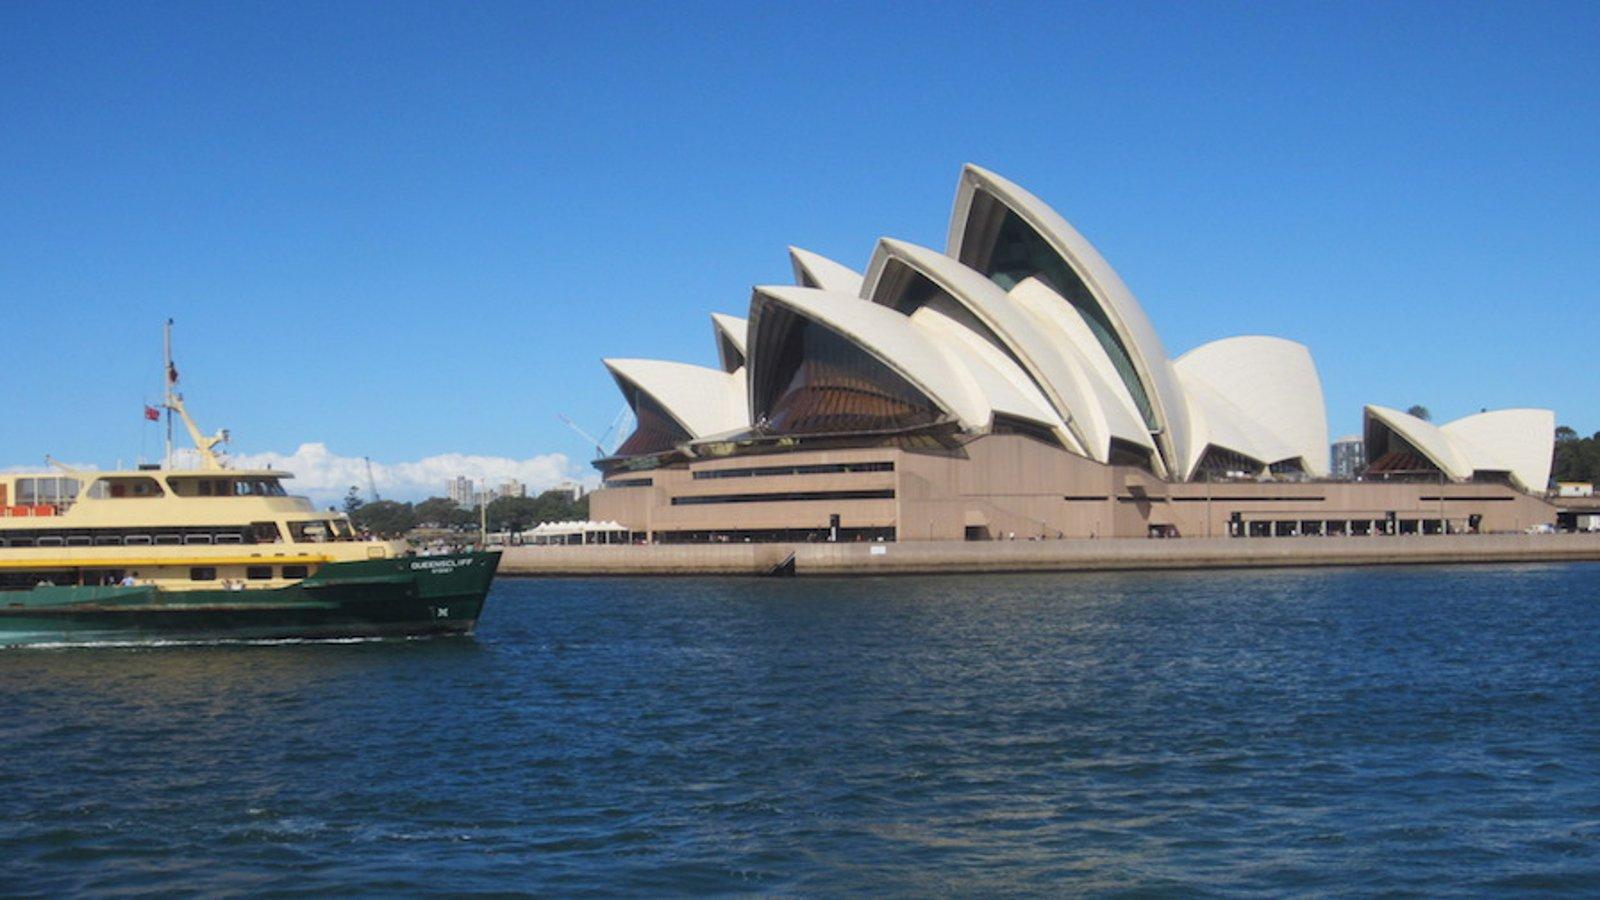 The Australian City